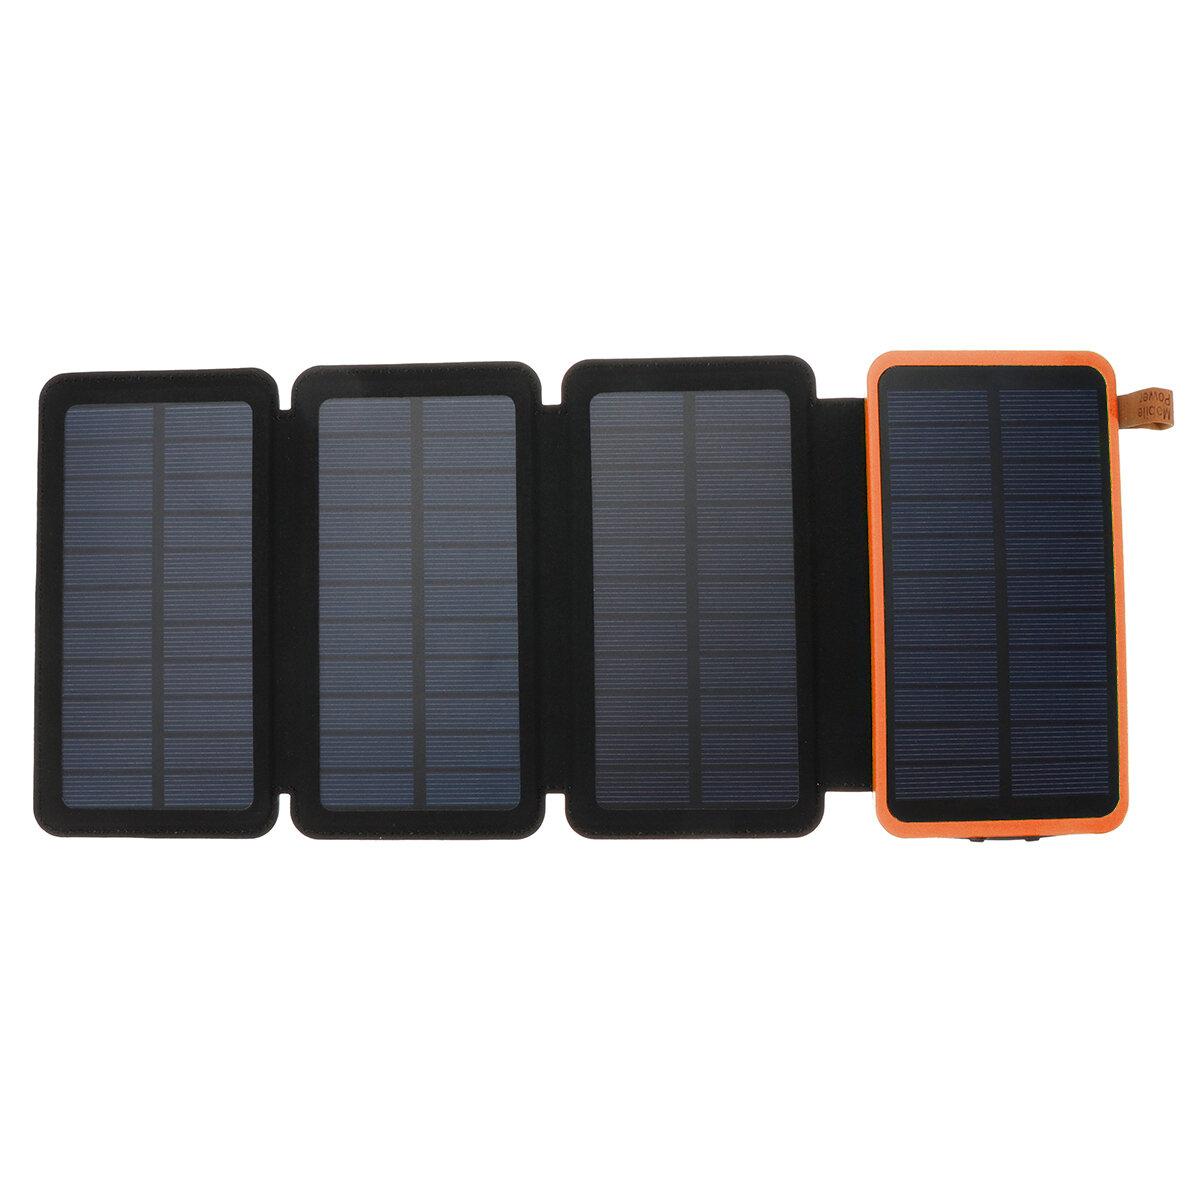 20000mAh Solar Panel Solar Charger 7W 5V/2A Foldable Solar Panel Charger Dual USB Portable Mobile Power Bank